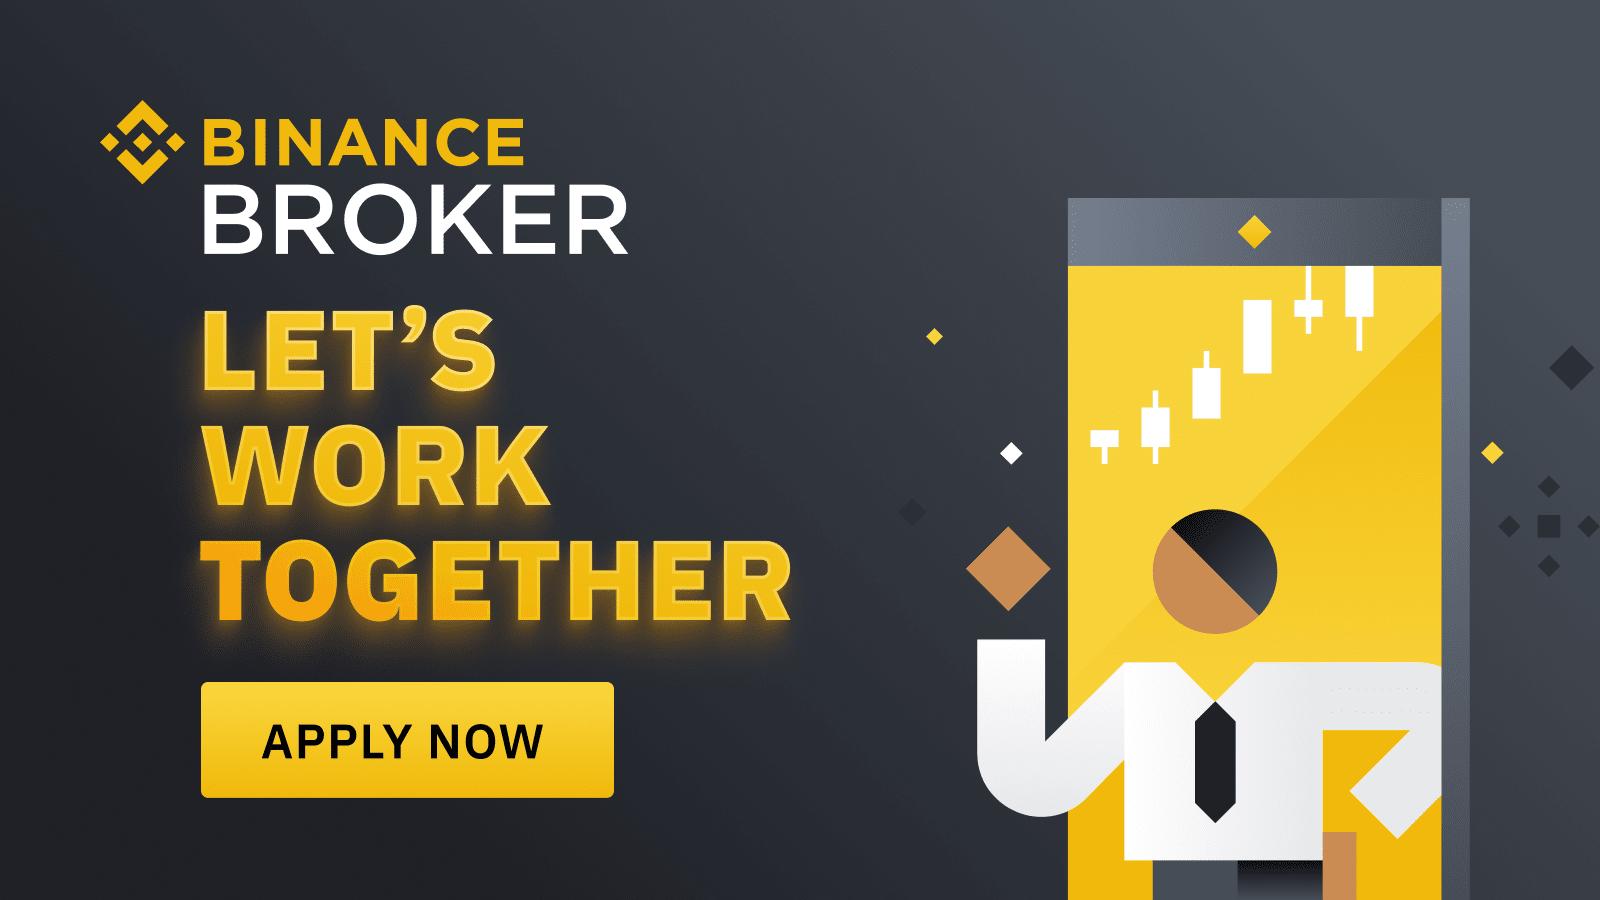 Binance Broker Spotlight, Part 2: More Entrepreneurs Growing Their Platforms, Powered by BinanceCryptocurrency Trading Signals, Strategies & Templates | DexStrats